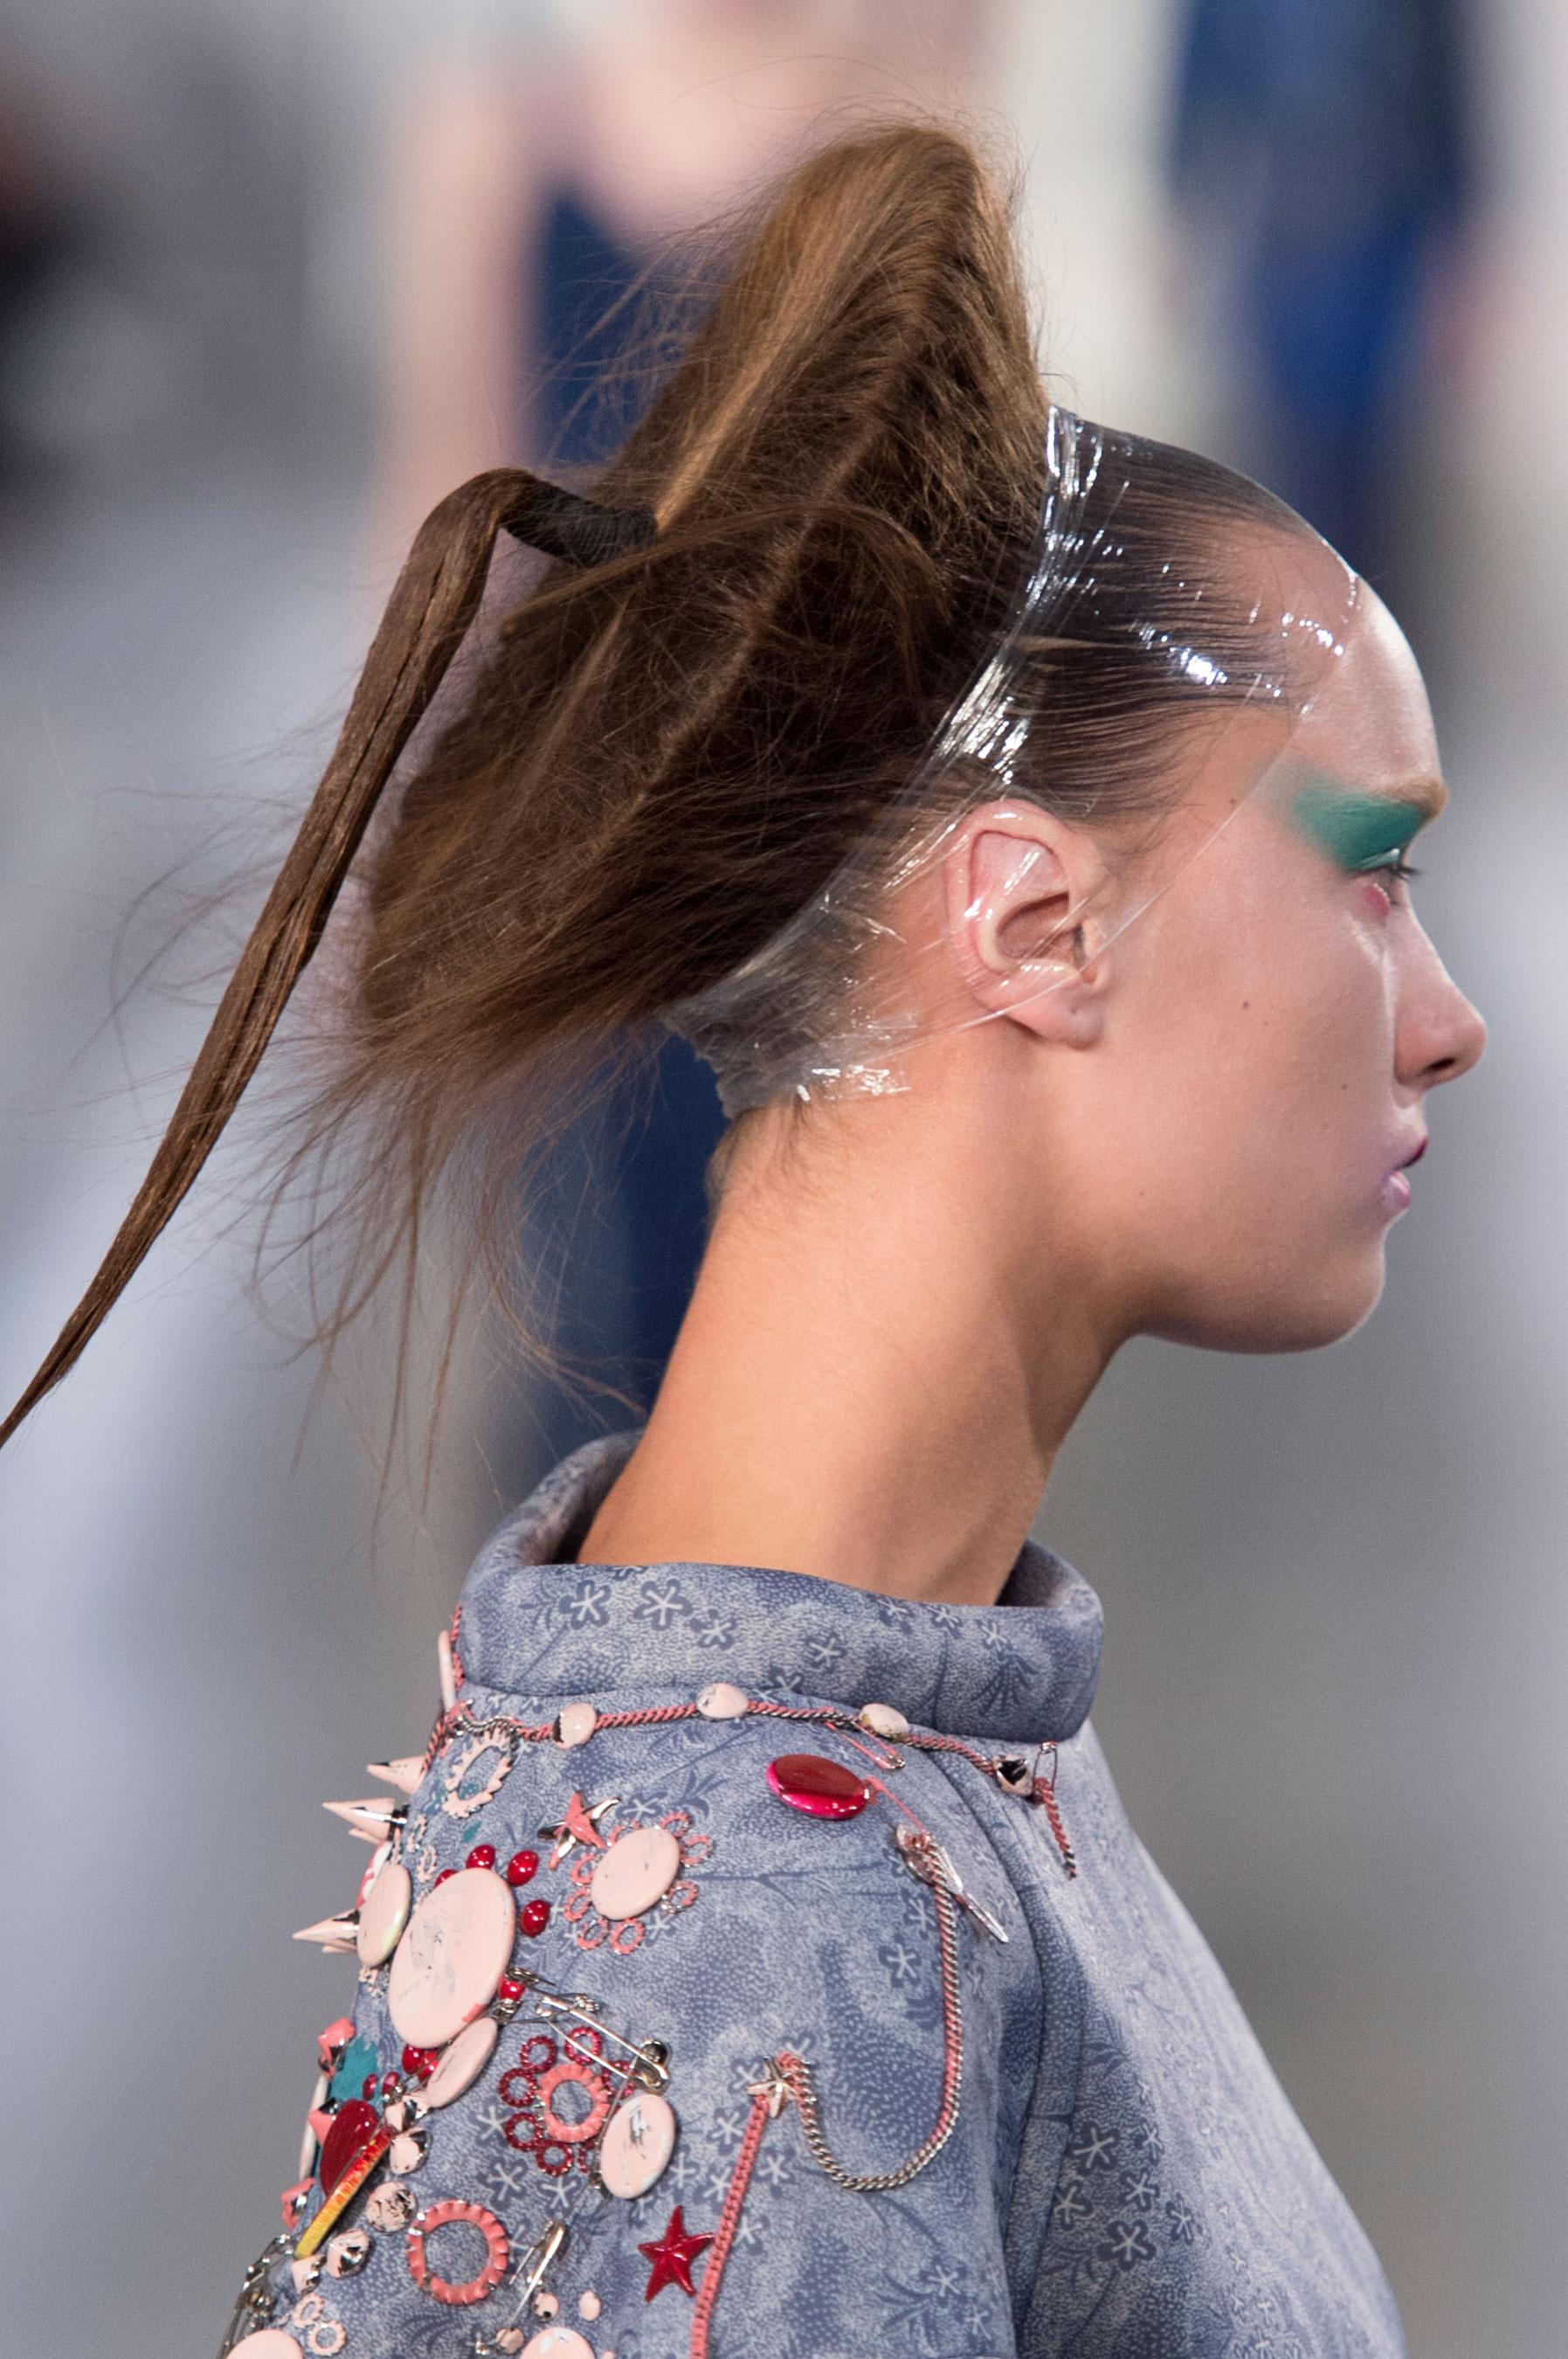 Maison-Margiela-spring-2016-runway-beauty-fashion-show-the-impression-053